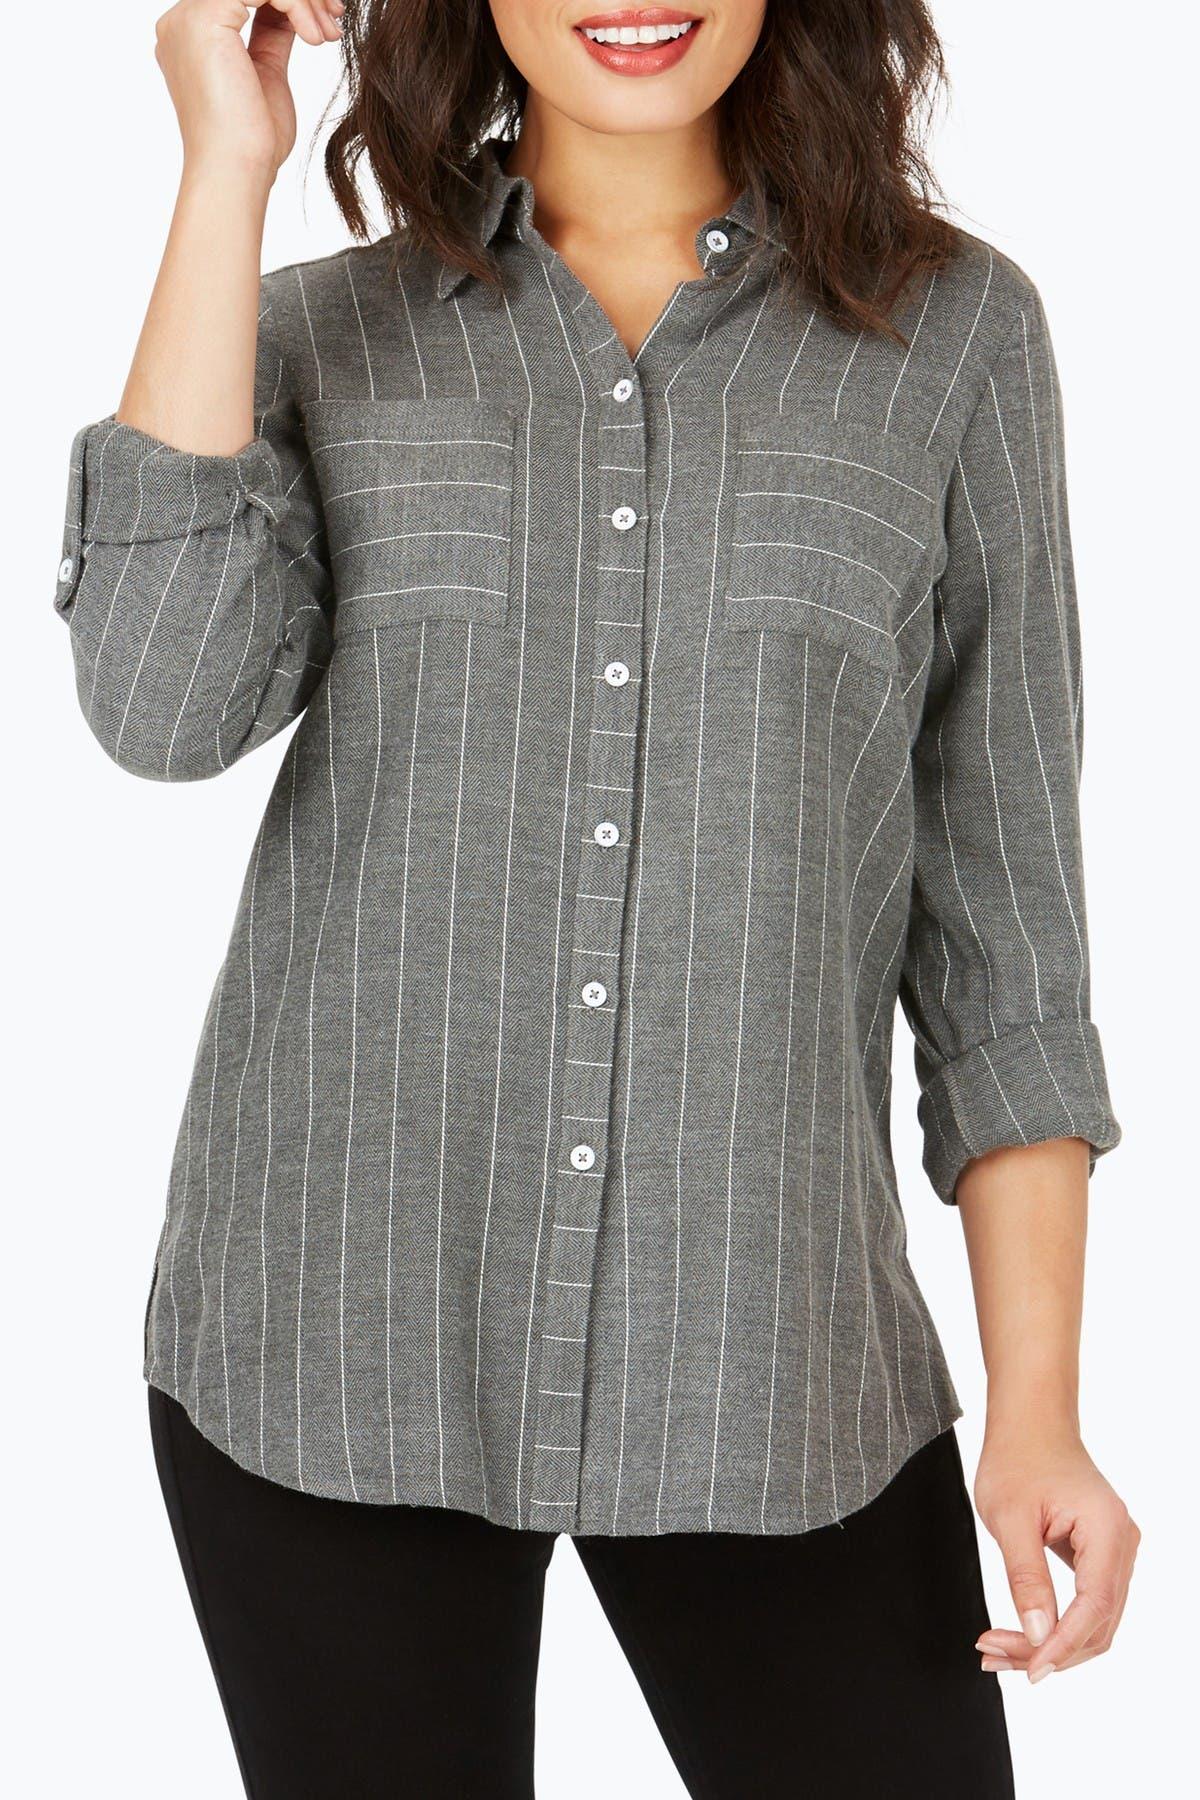 Image of FOXCROFT Zoey Brushed Pinstripe Herringbone Shirt